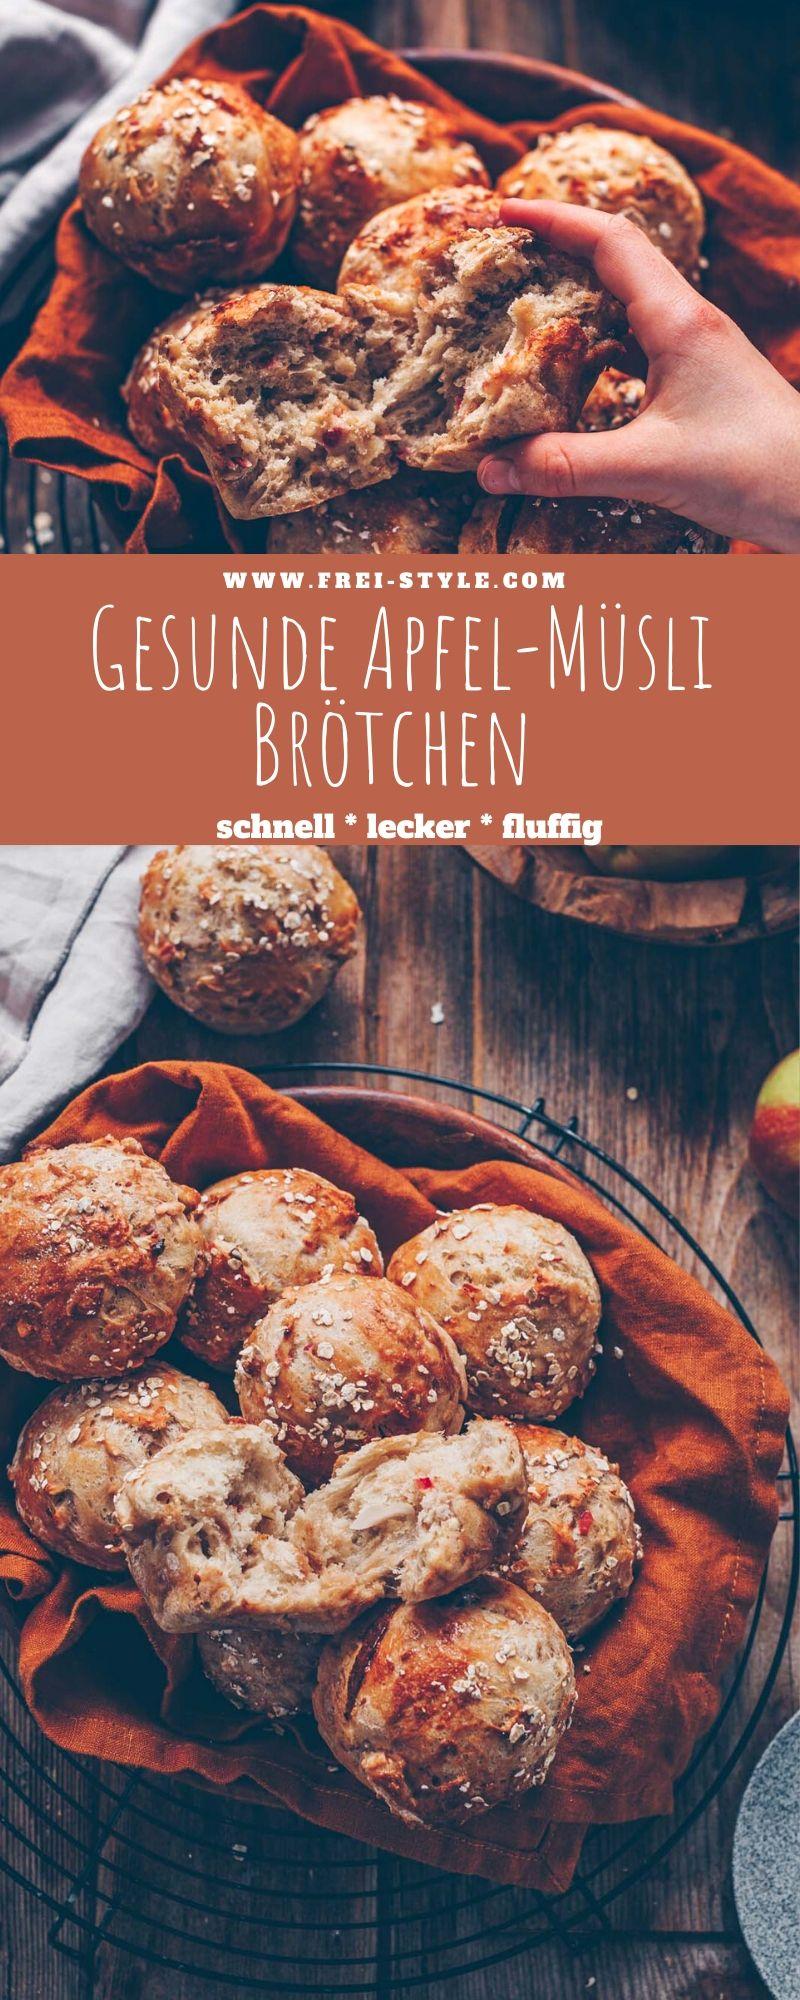 Gesunde Apfel-Müsli Brötchen